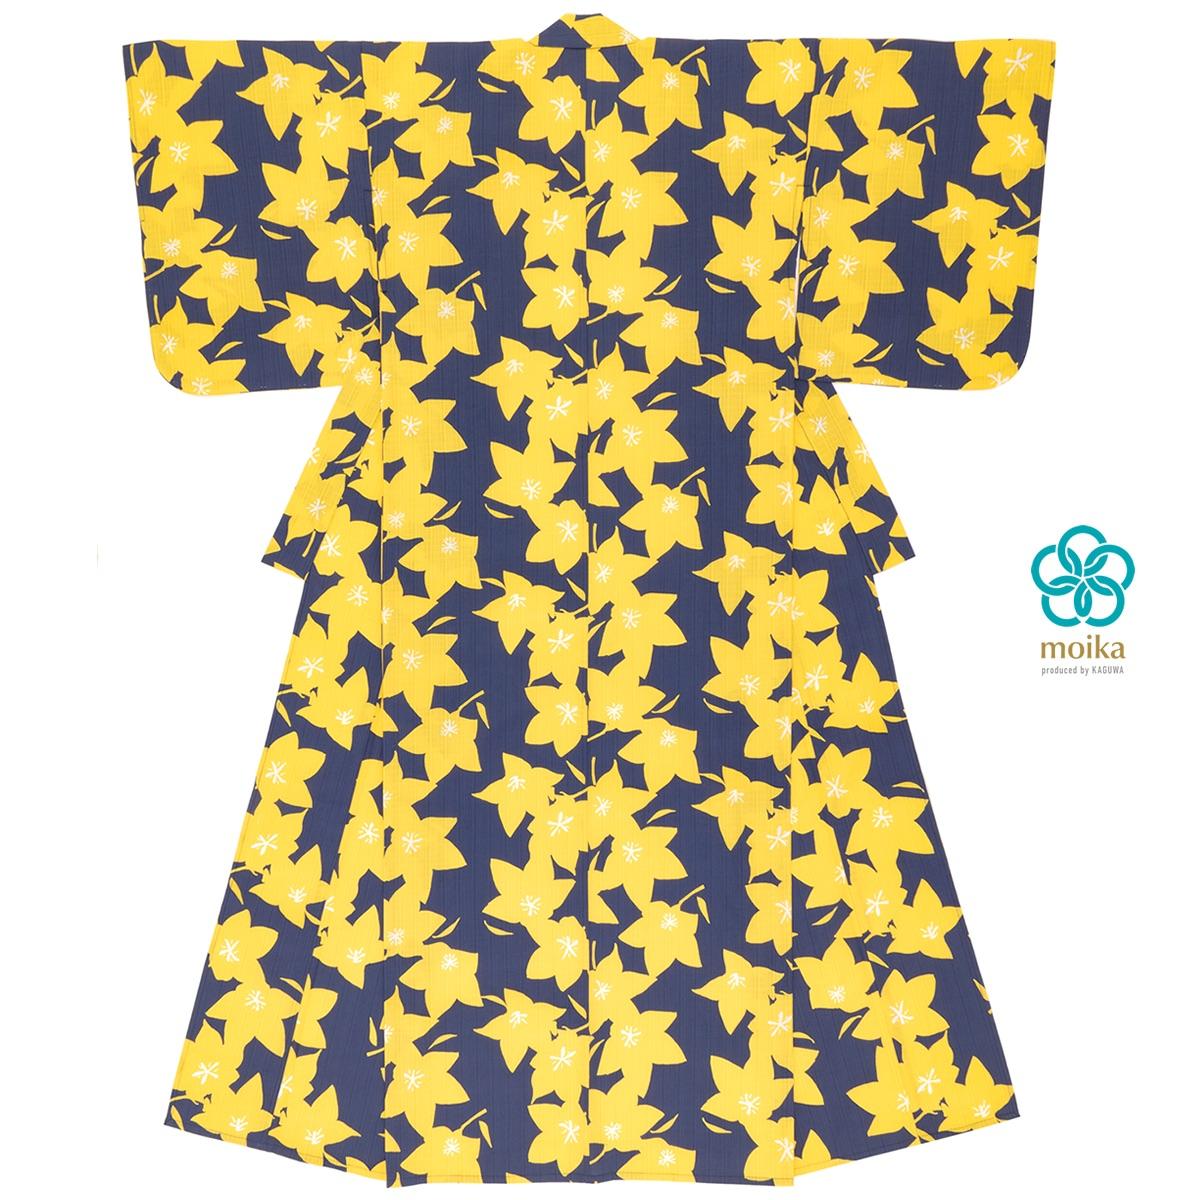 moika 浴衣 レディース 単品 Mサイズ レトロ 紺 ネイビー 桔梗 花 フラワー 衿芯付き 女性用 仕立て上がり